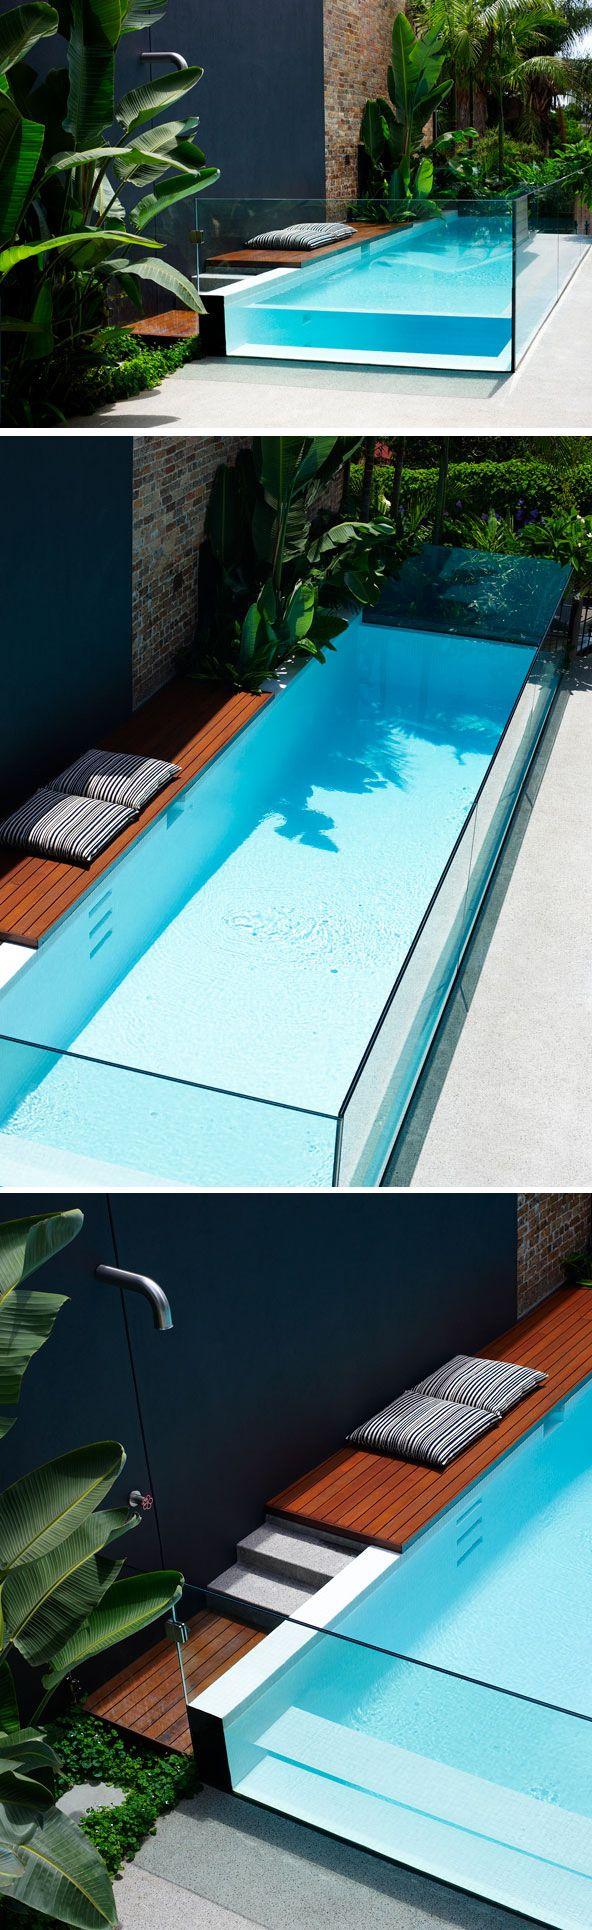 Pool schwimmbad ur ban - Gartengestaltungsideen mit pool ...